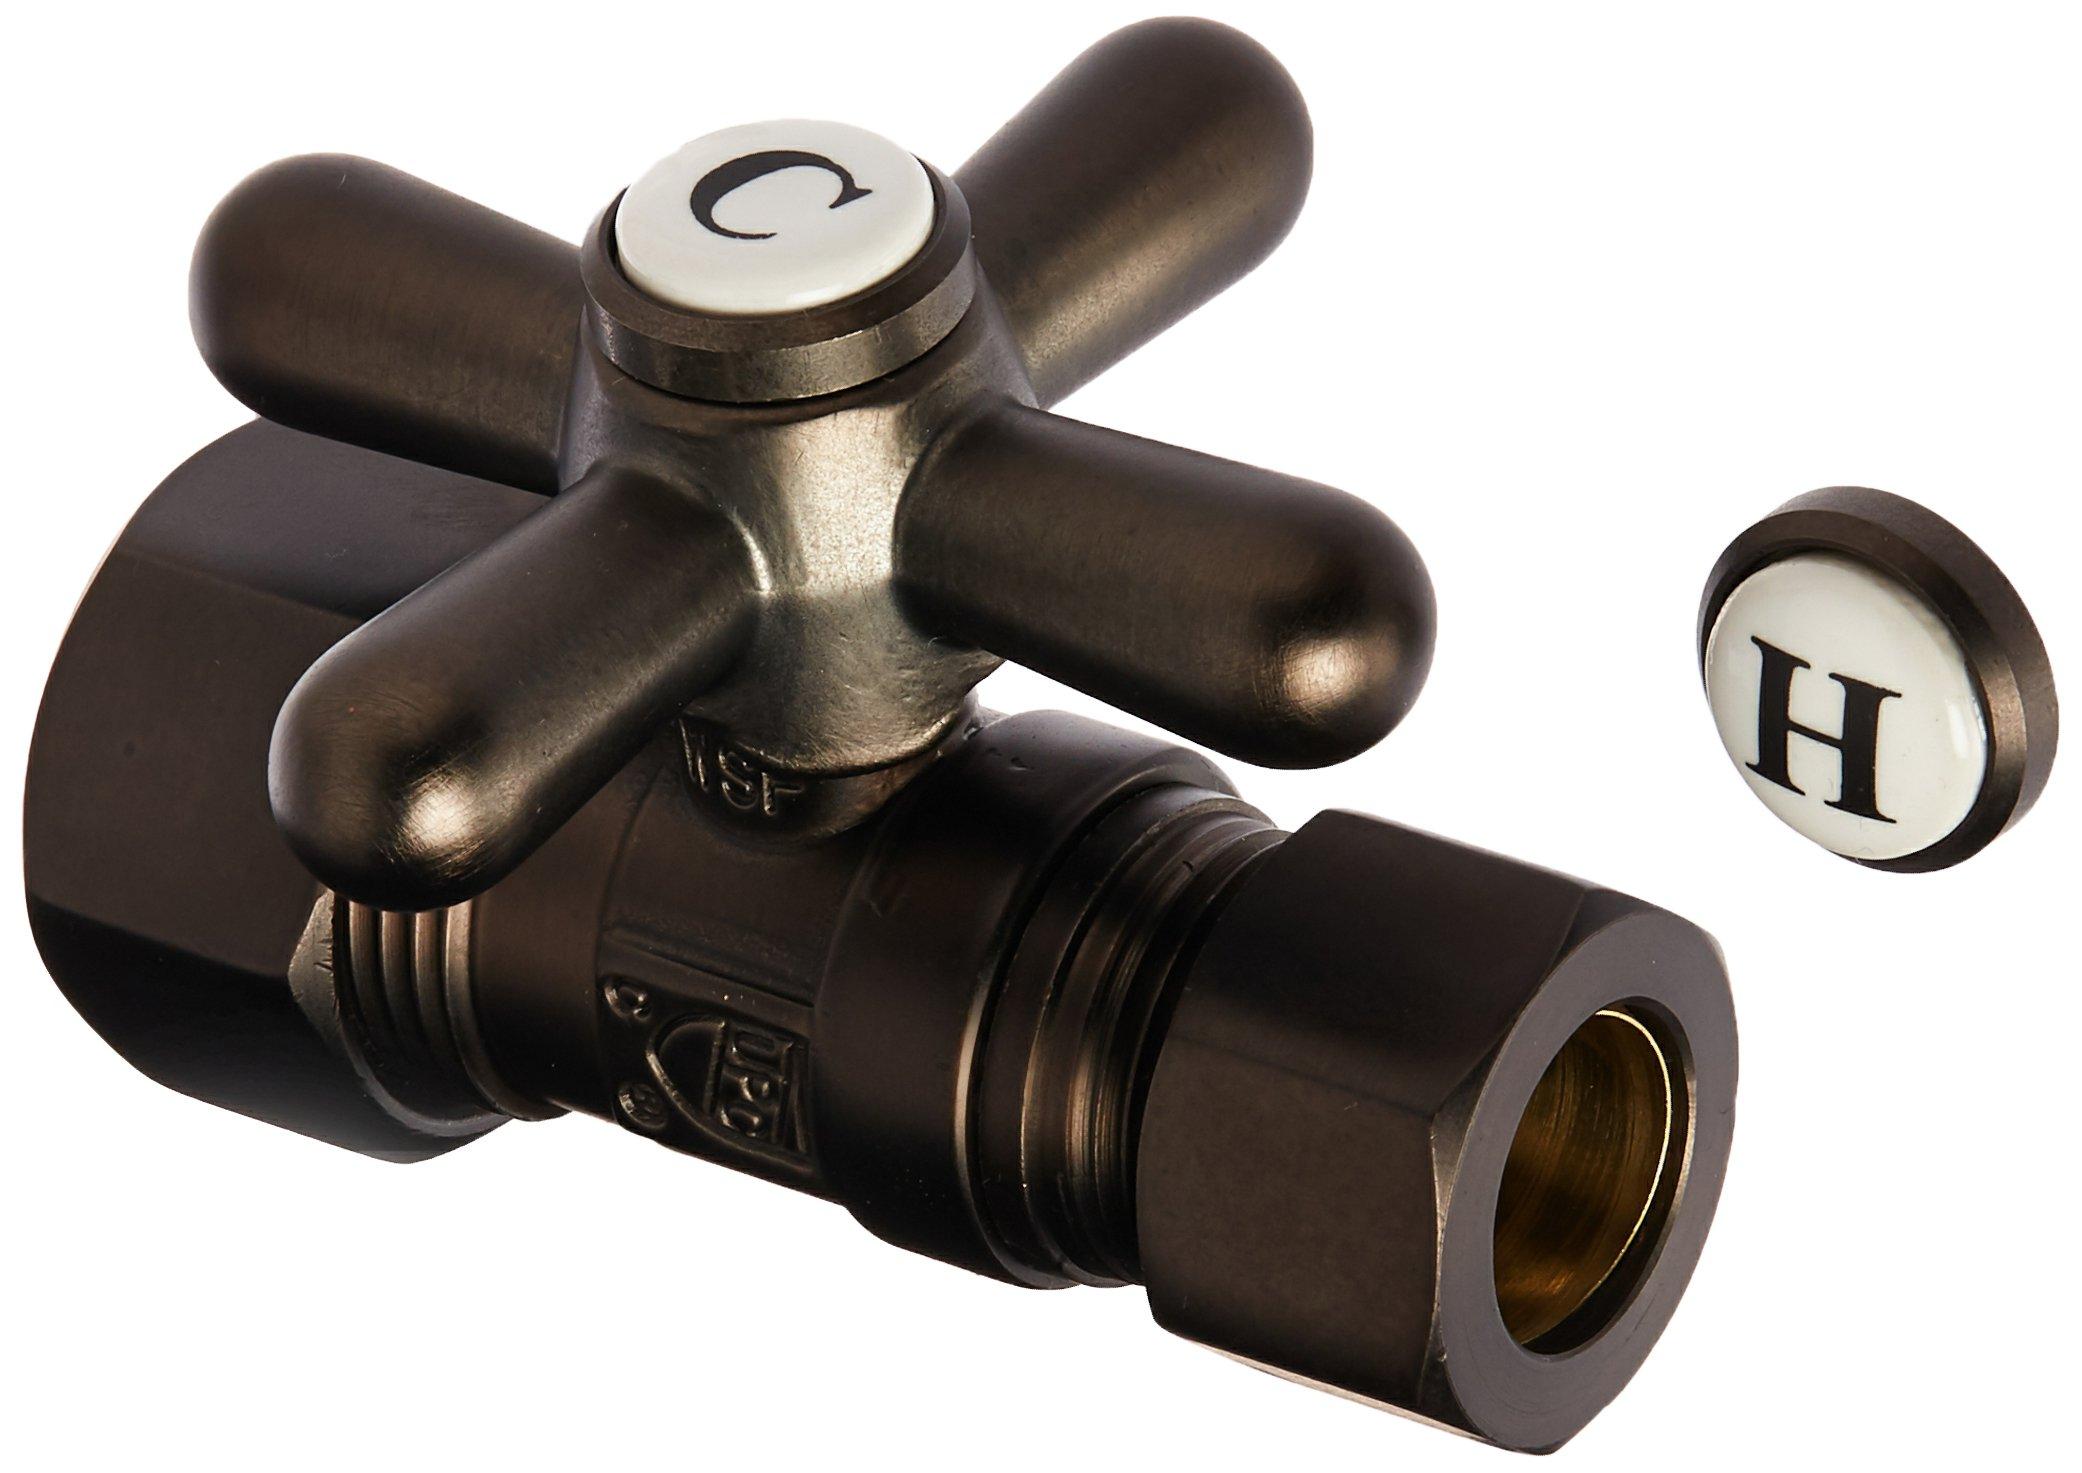 Kingston Brass CC44455X Vintage 5/8-Inch OD x 1/2-Inch OD Compression Straight Stop Valve, Oil Rubbed Bronze